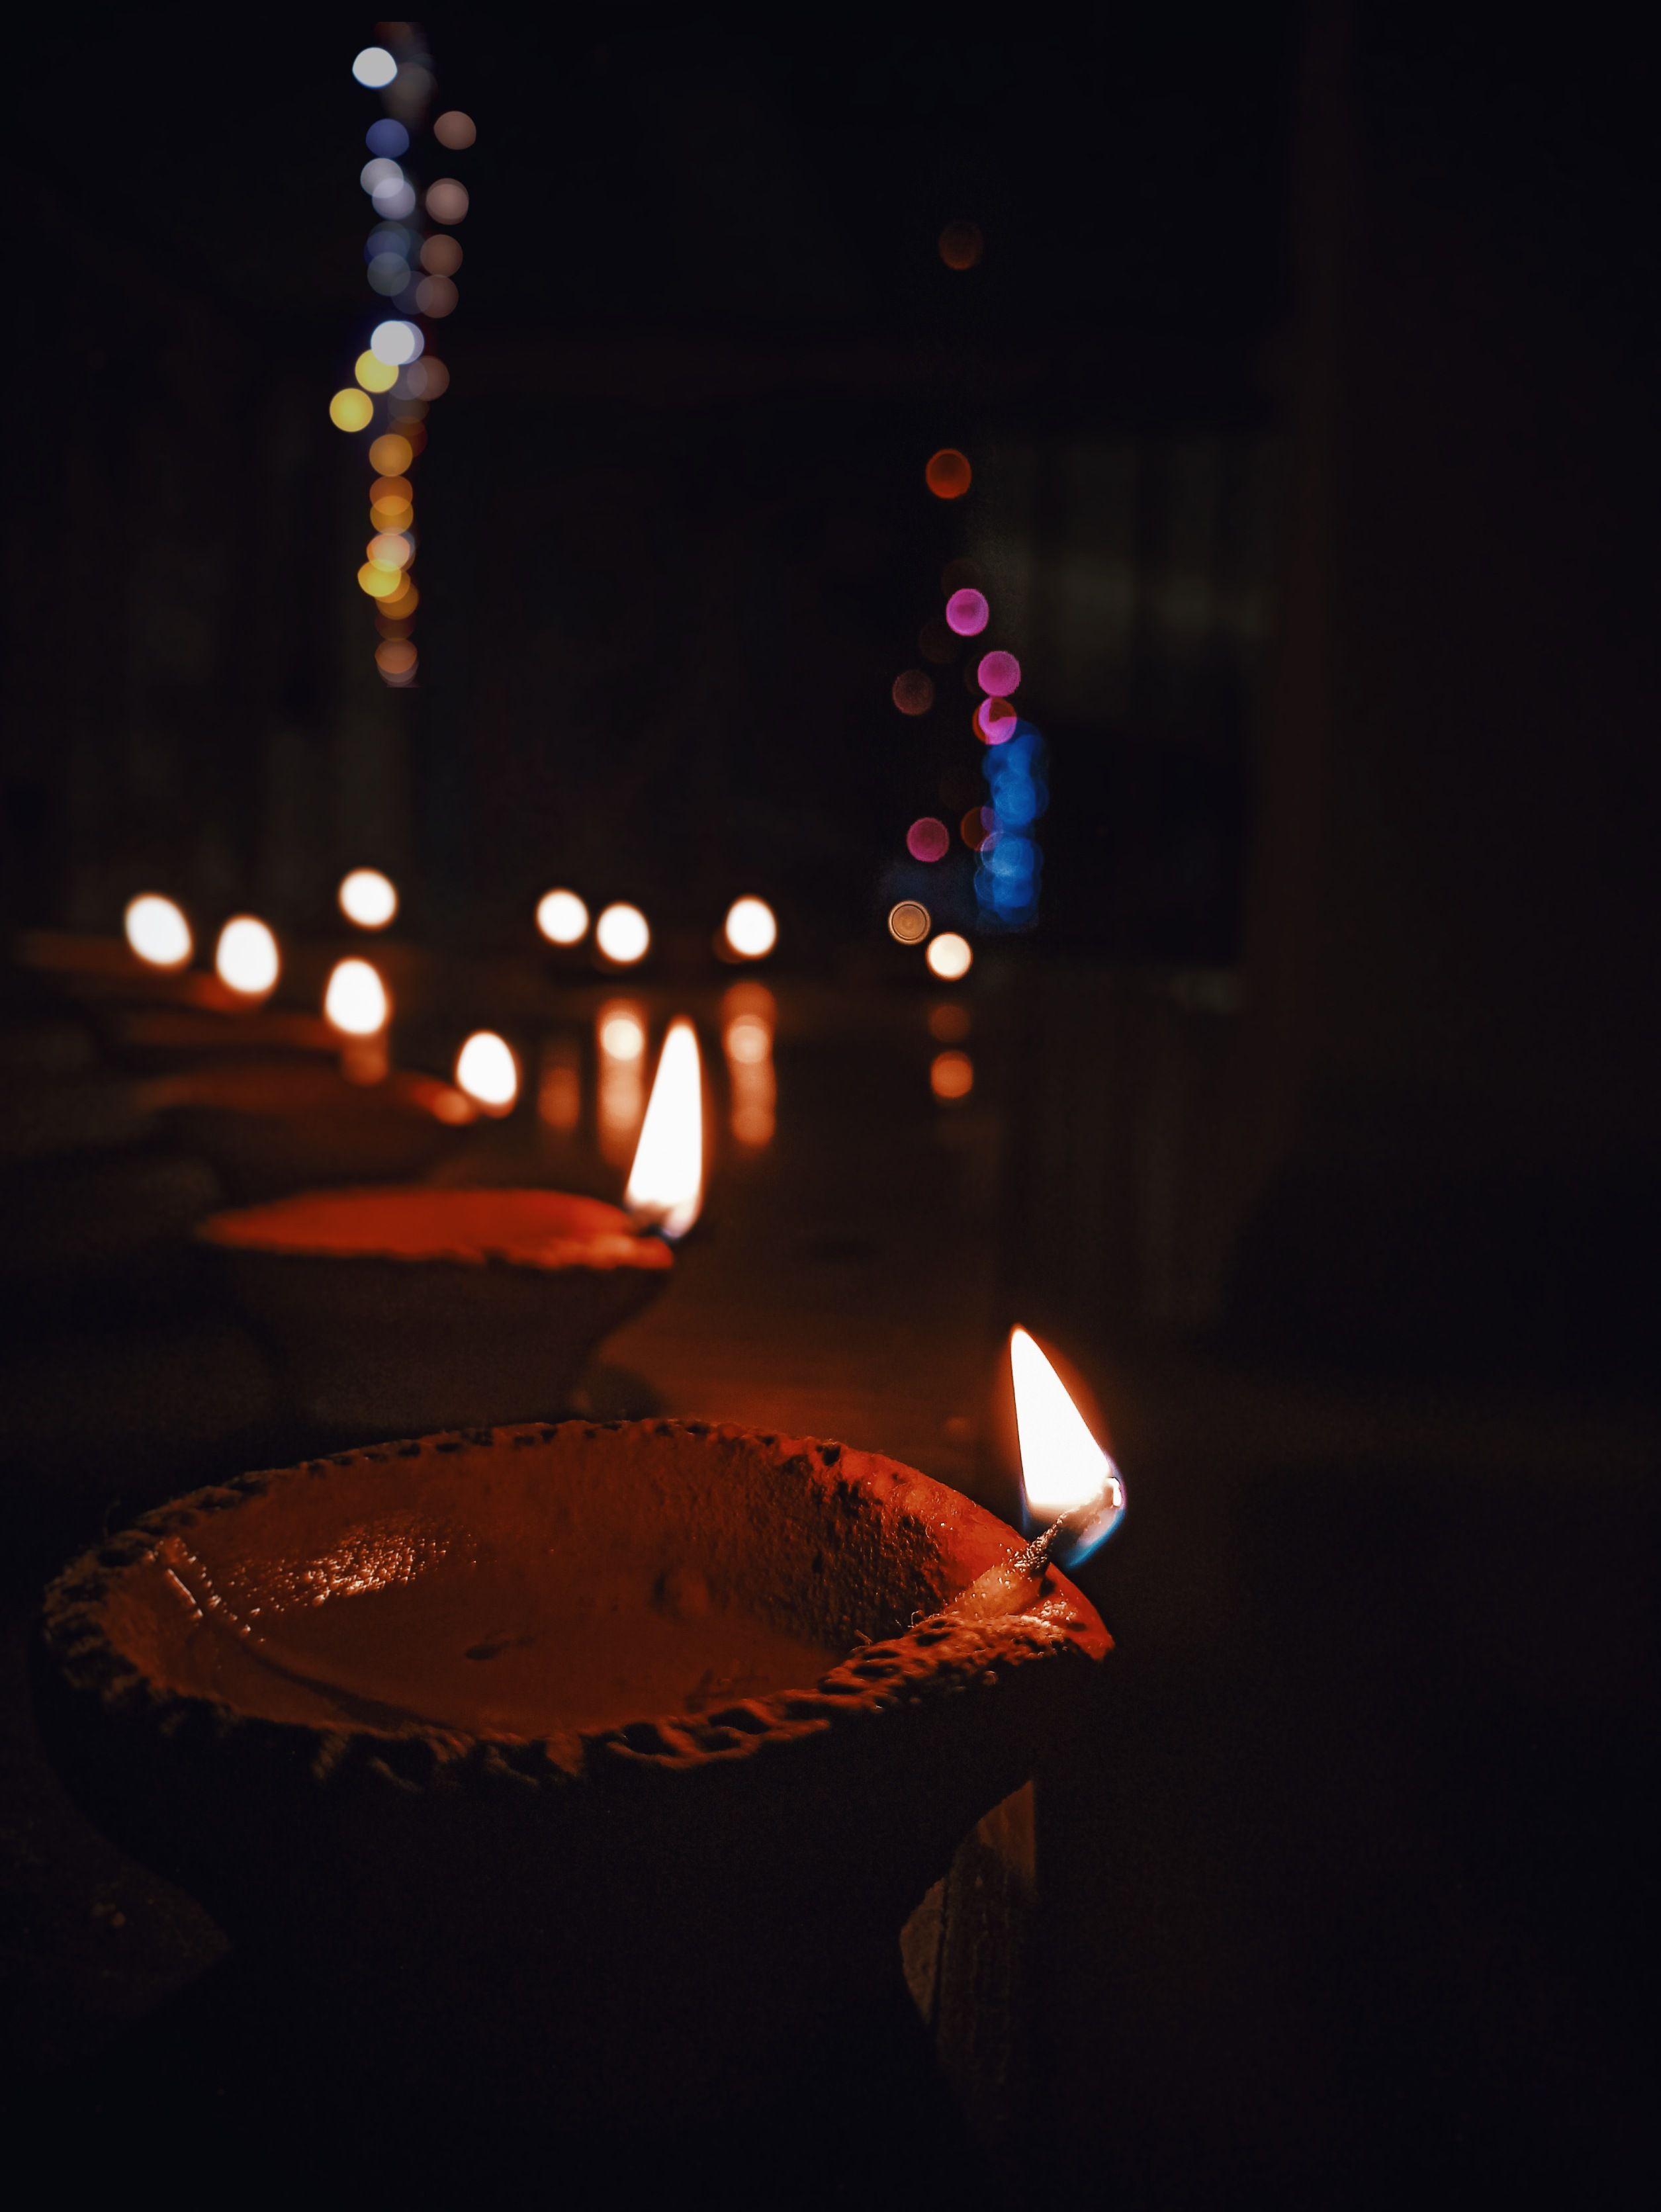 Happy Diwali ❤️ . . #ShotOnRedmi @redmiindia #note8pro . Captured by-@umesh.sonii . . #diwali #happydiwali #festiveseason #dhanteras #diya #lamp #light #festivaloflights #love #redmi #xiaomi #mobilephotography #umeshsonii @miuiindiaofficial @miuiofficial #diwaliwithredmi #redmireels #diwaliwithme